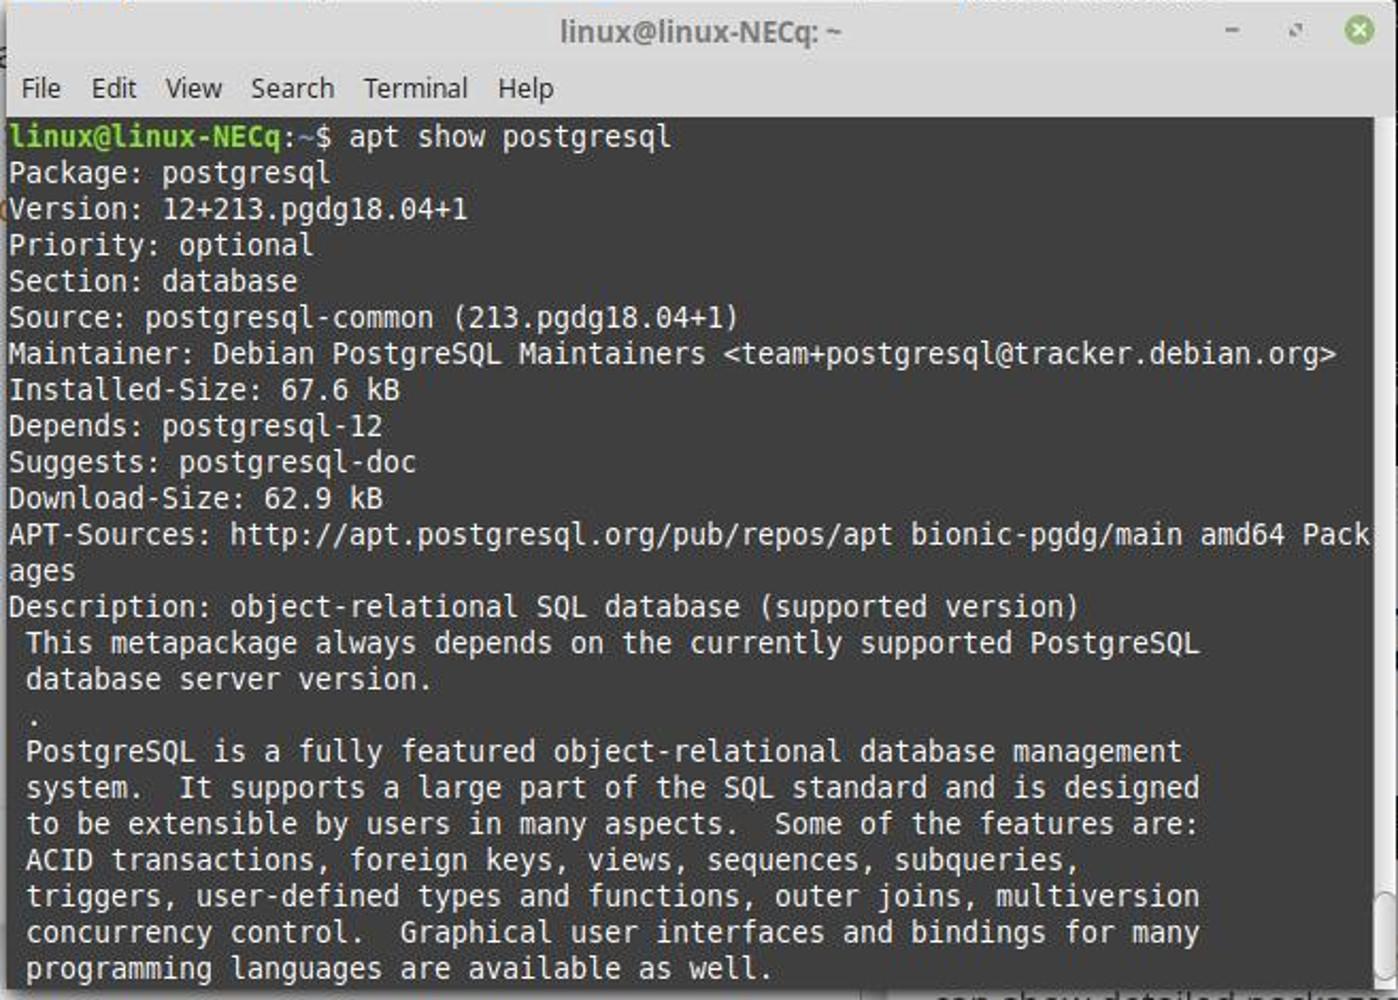 Screenshot of the terminal show PostgreSQL